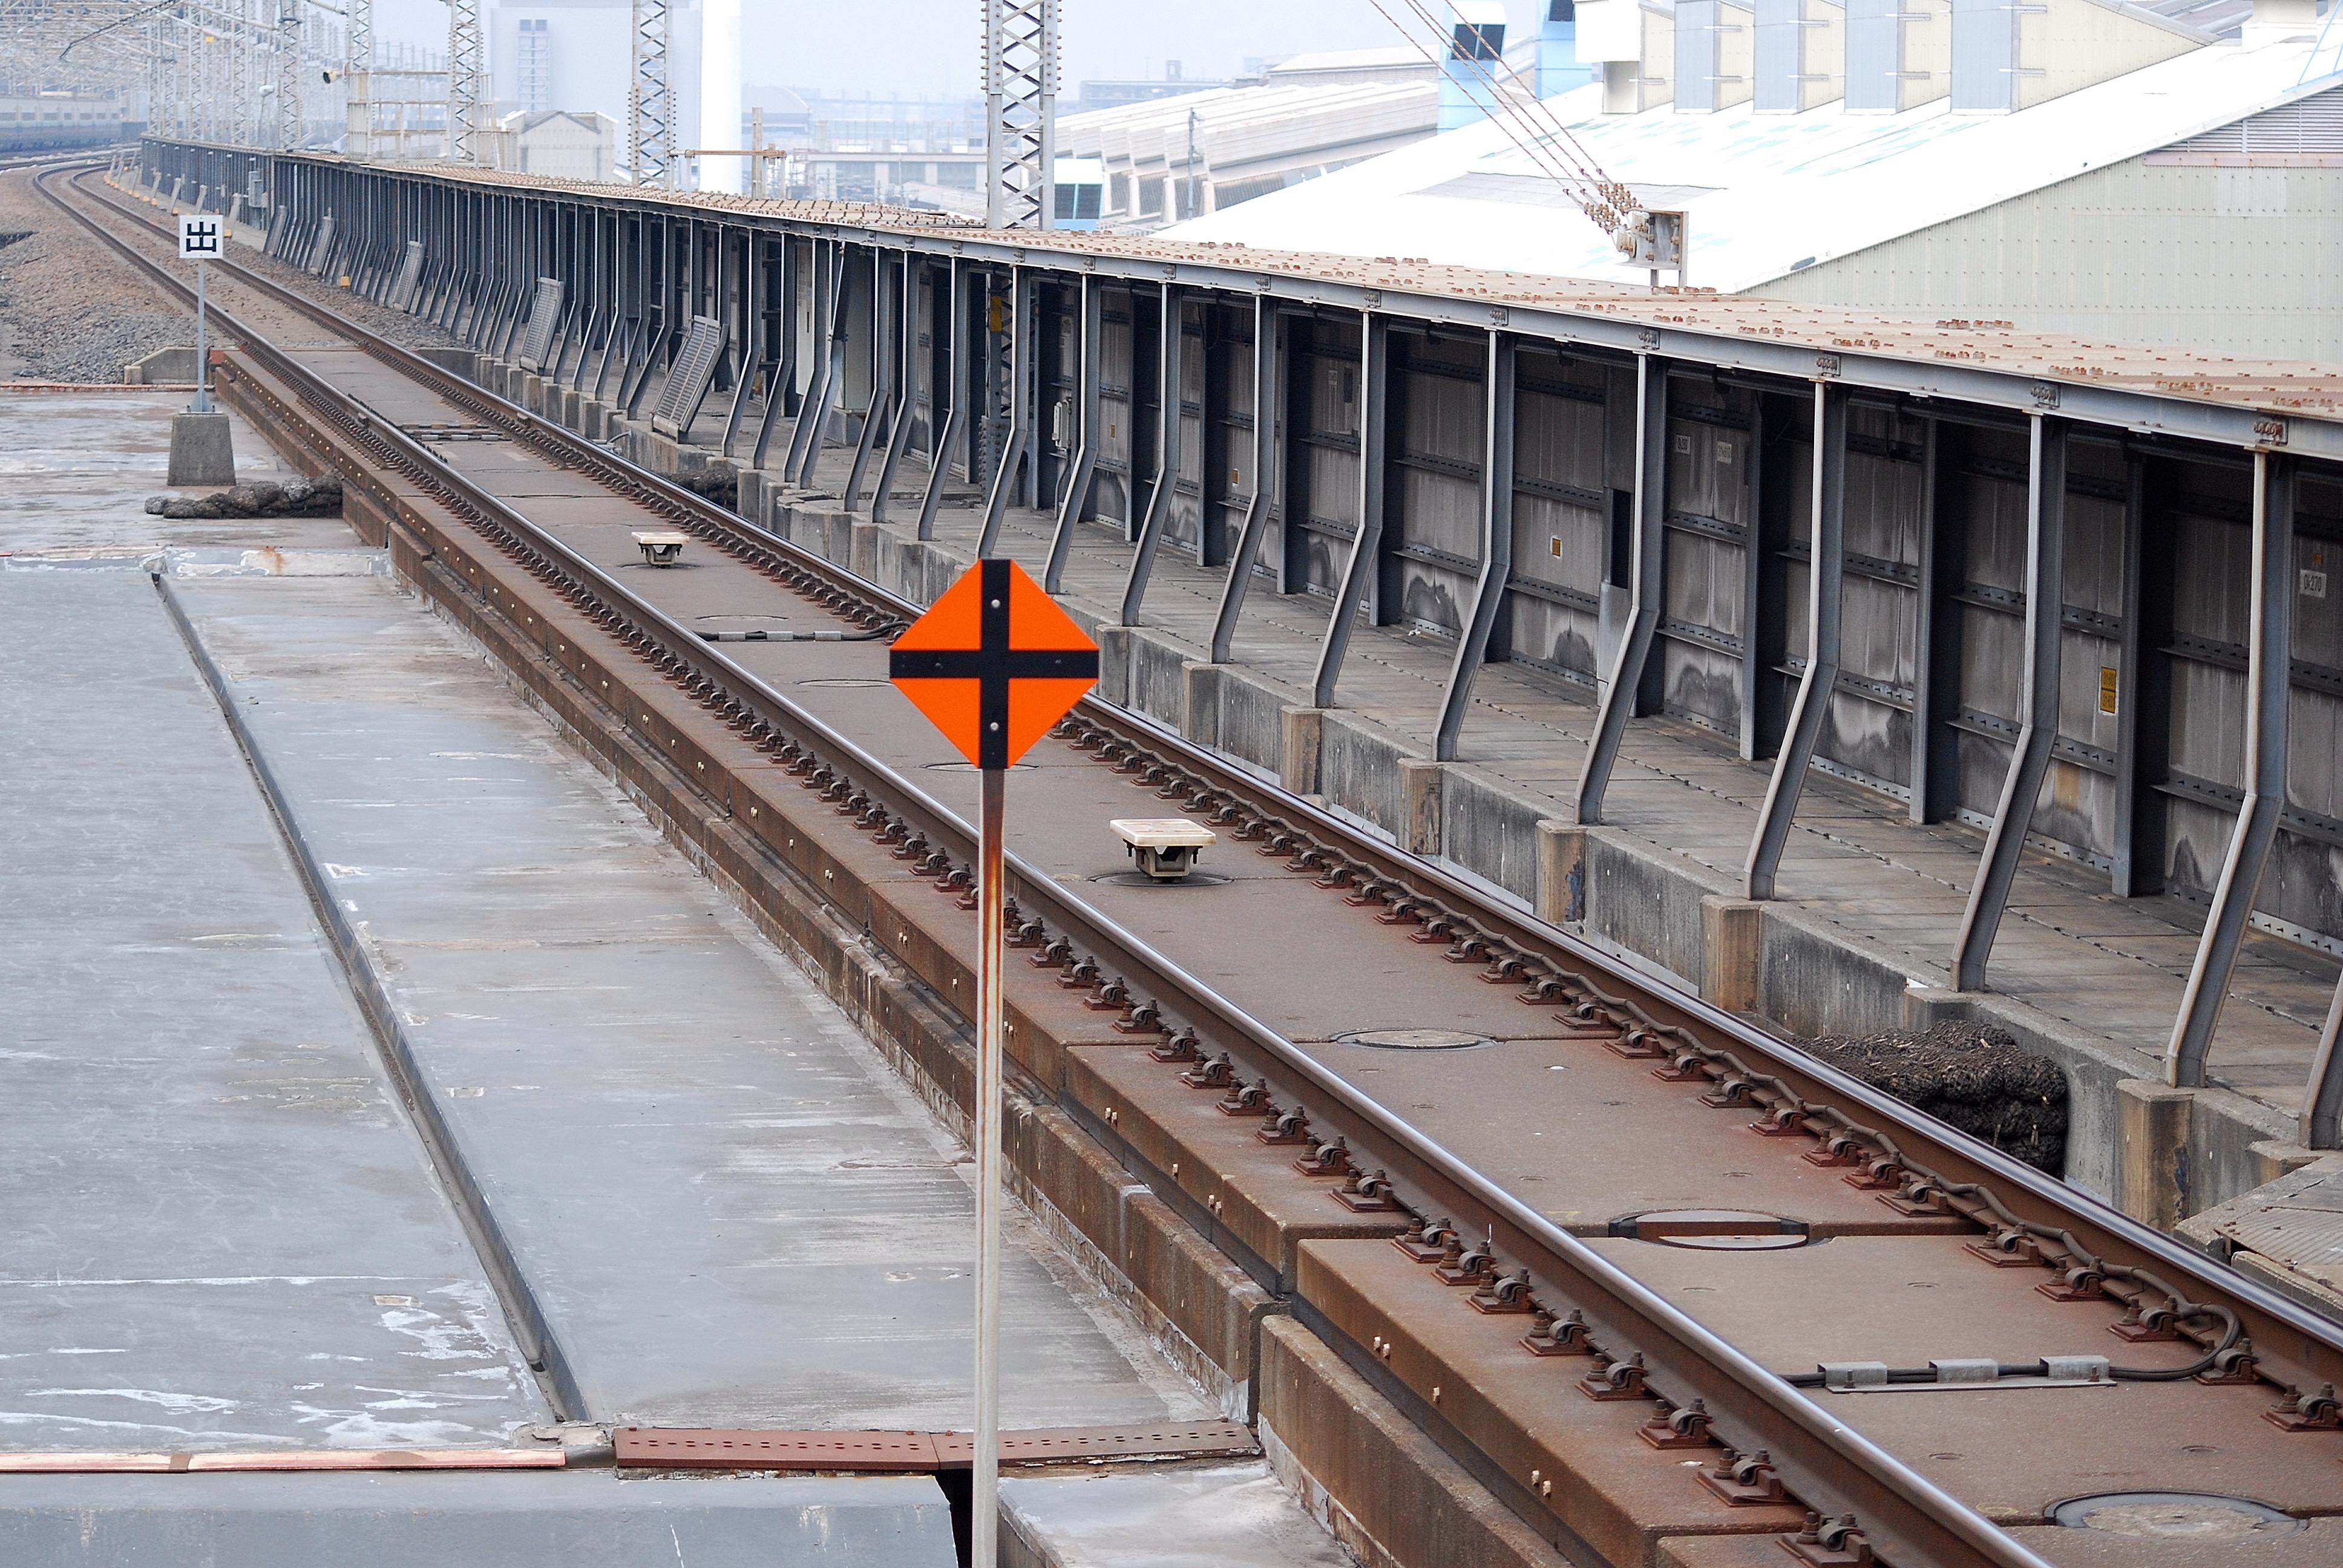 https://upload.wikimedia.org/wikipedia/commons/8/88/Shinkansen_ATC.JPG